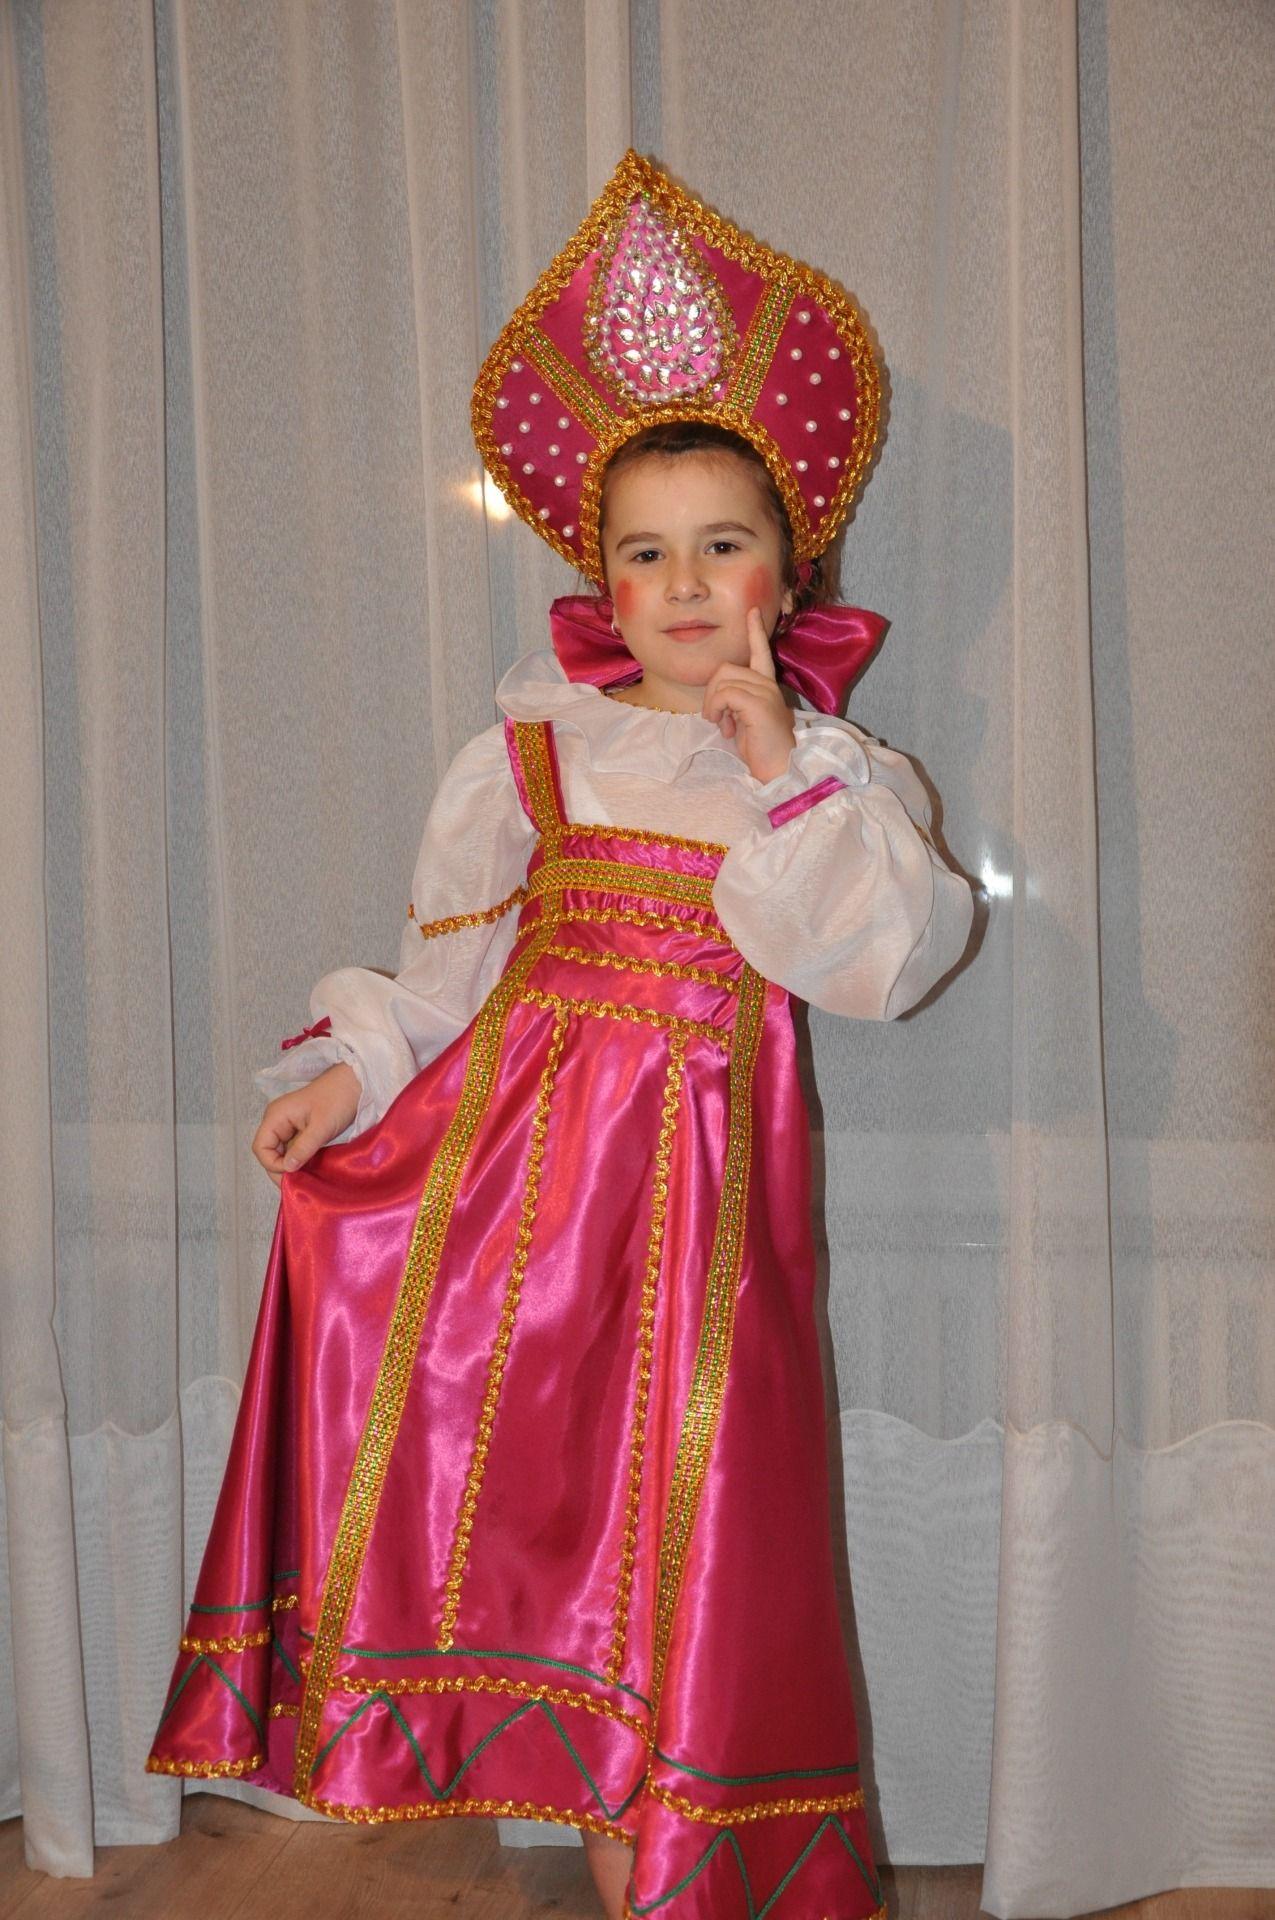 mode-filles-costume-folklorique-russe-2130843-dsc-0040-977ea_big.jpg (1275×1920)